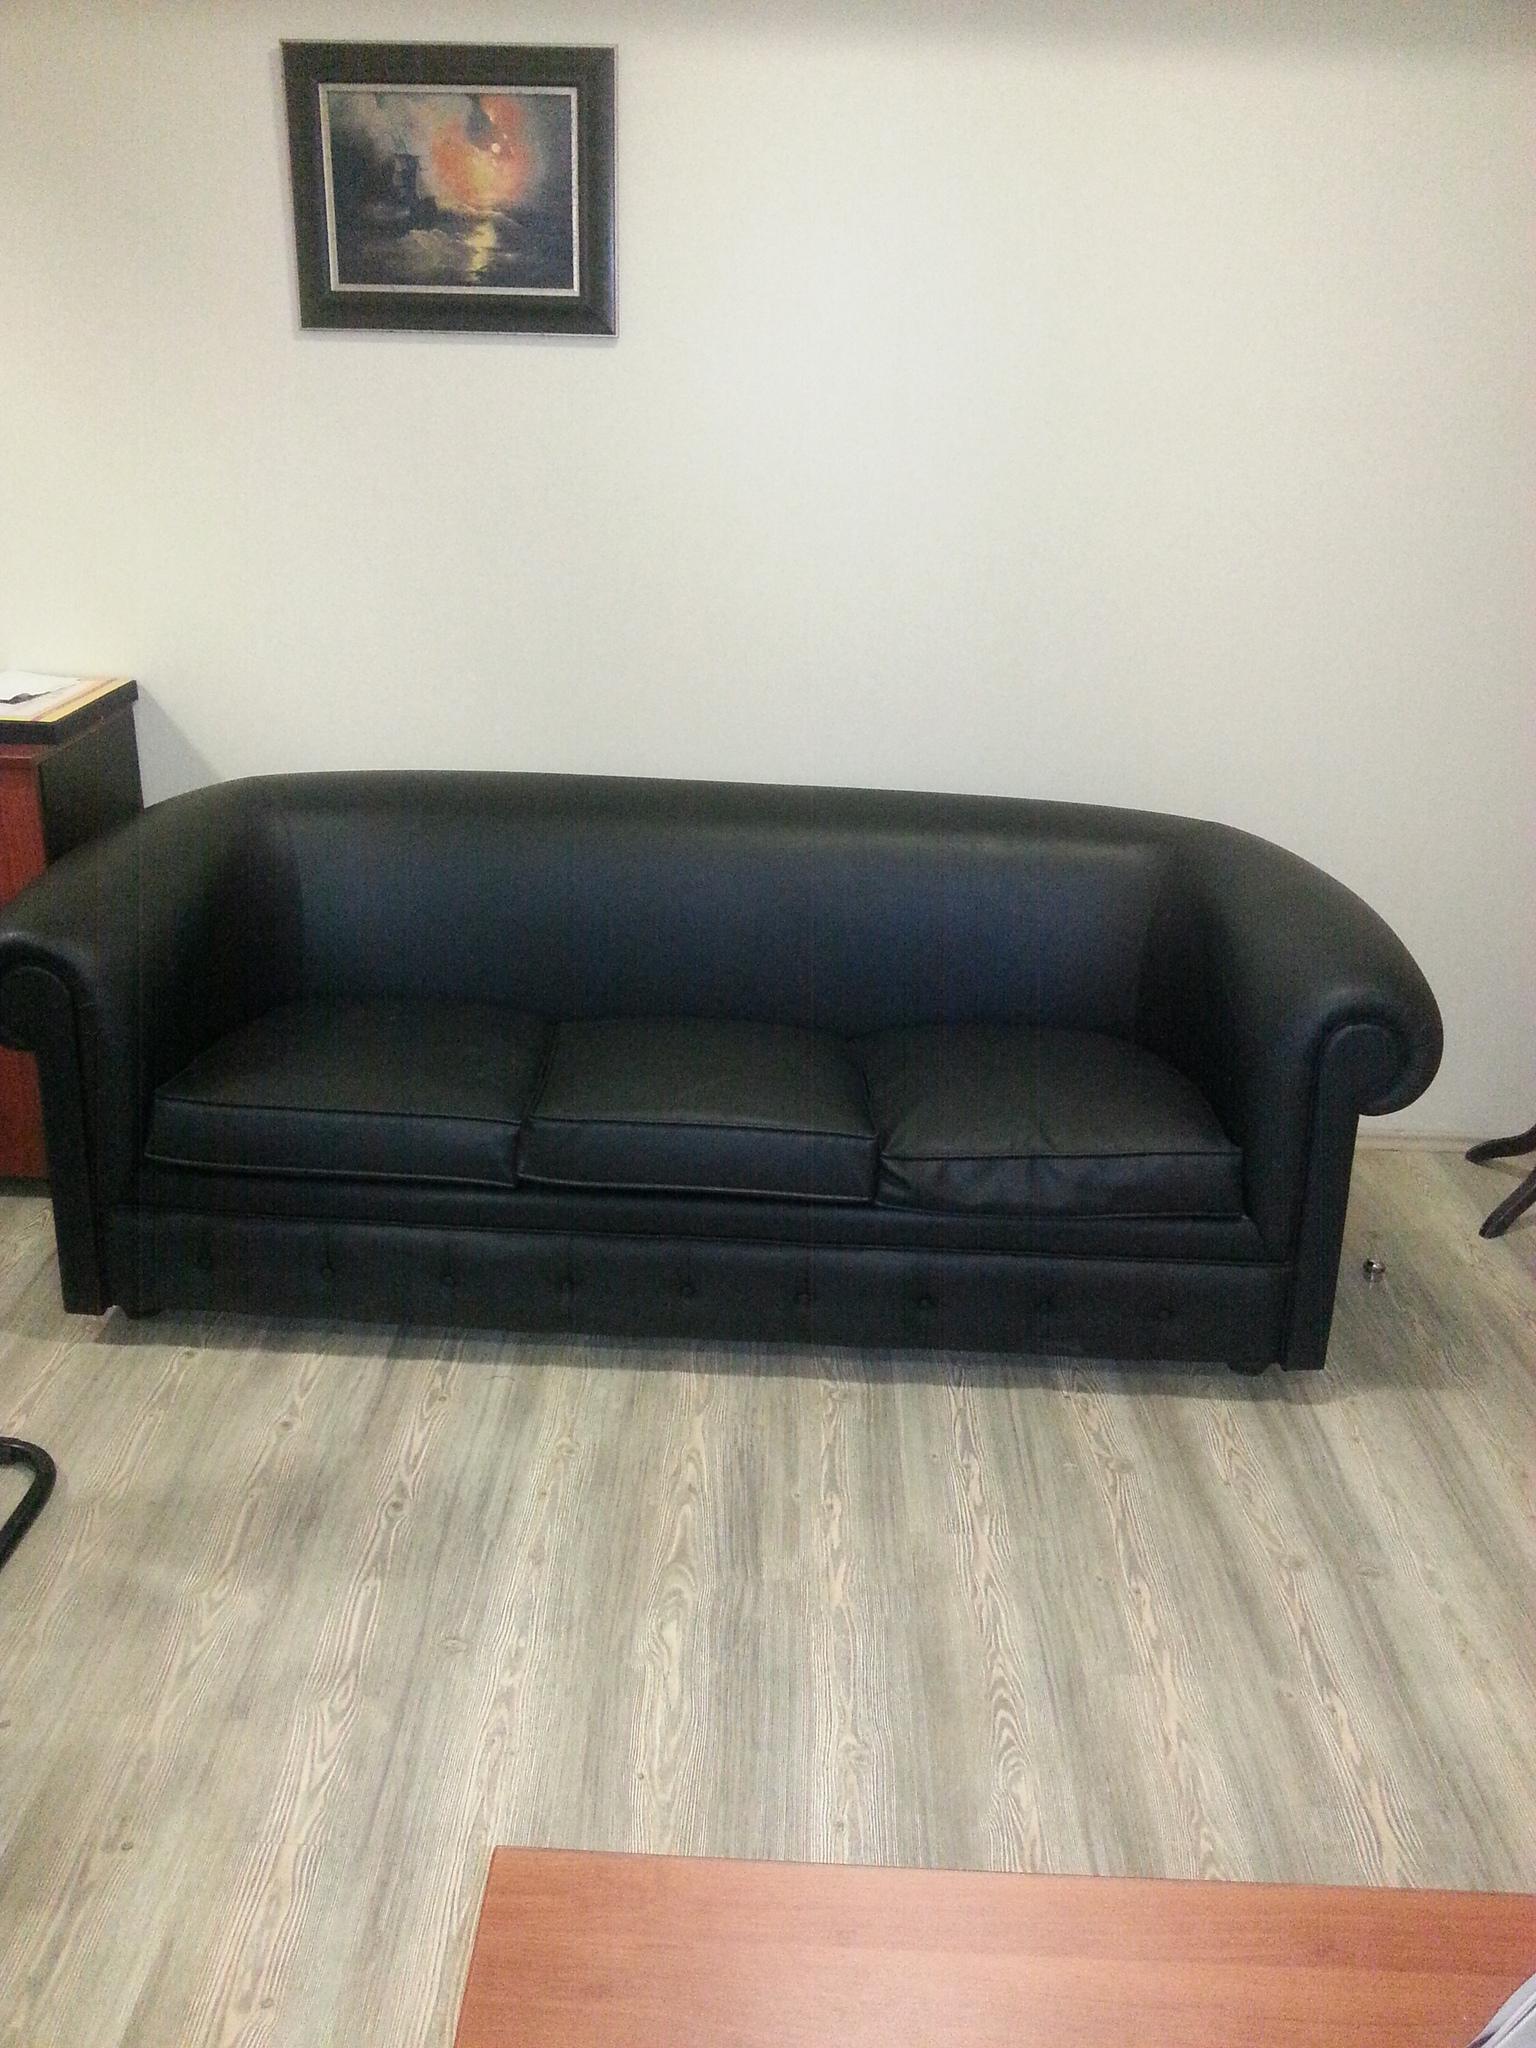 Casting couch az-4770